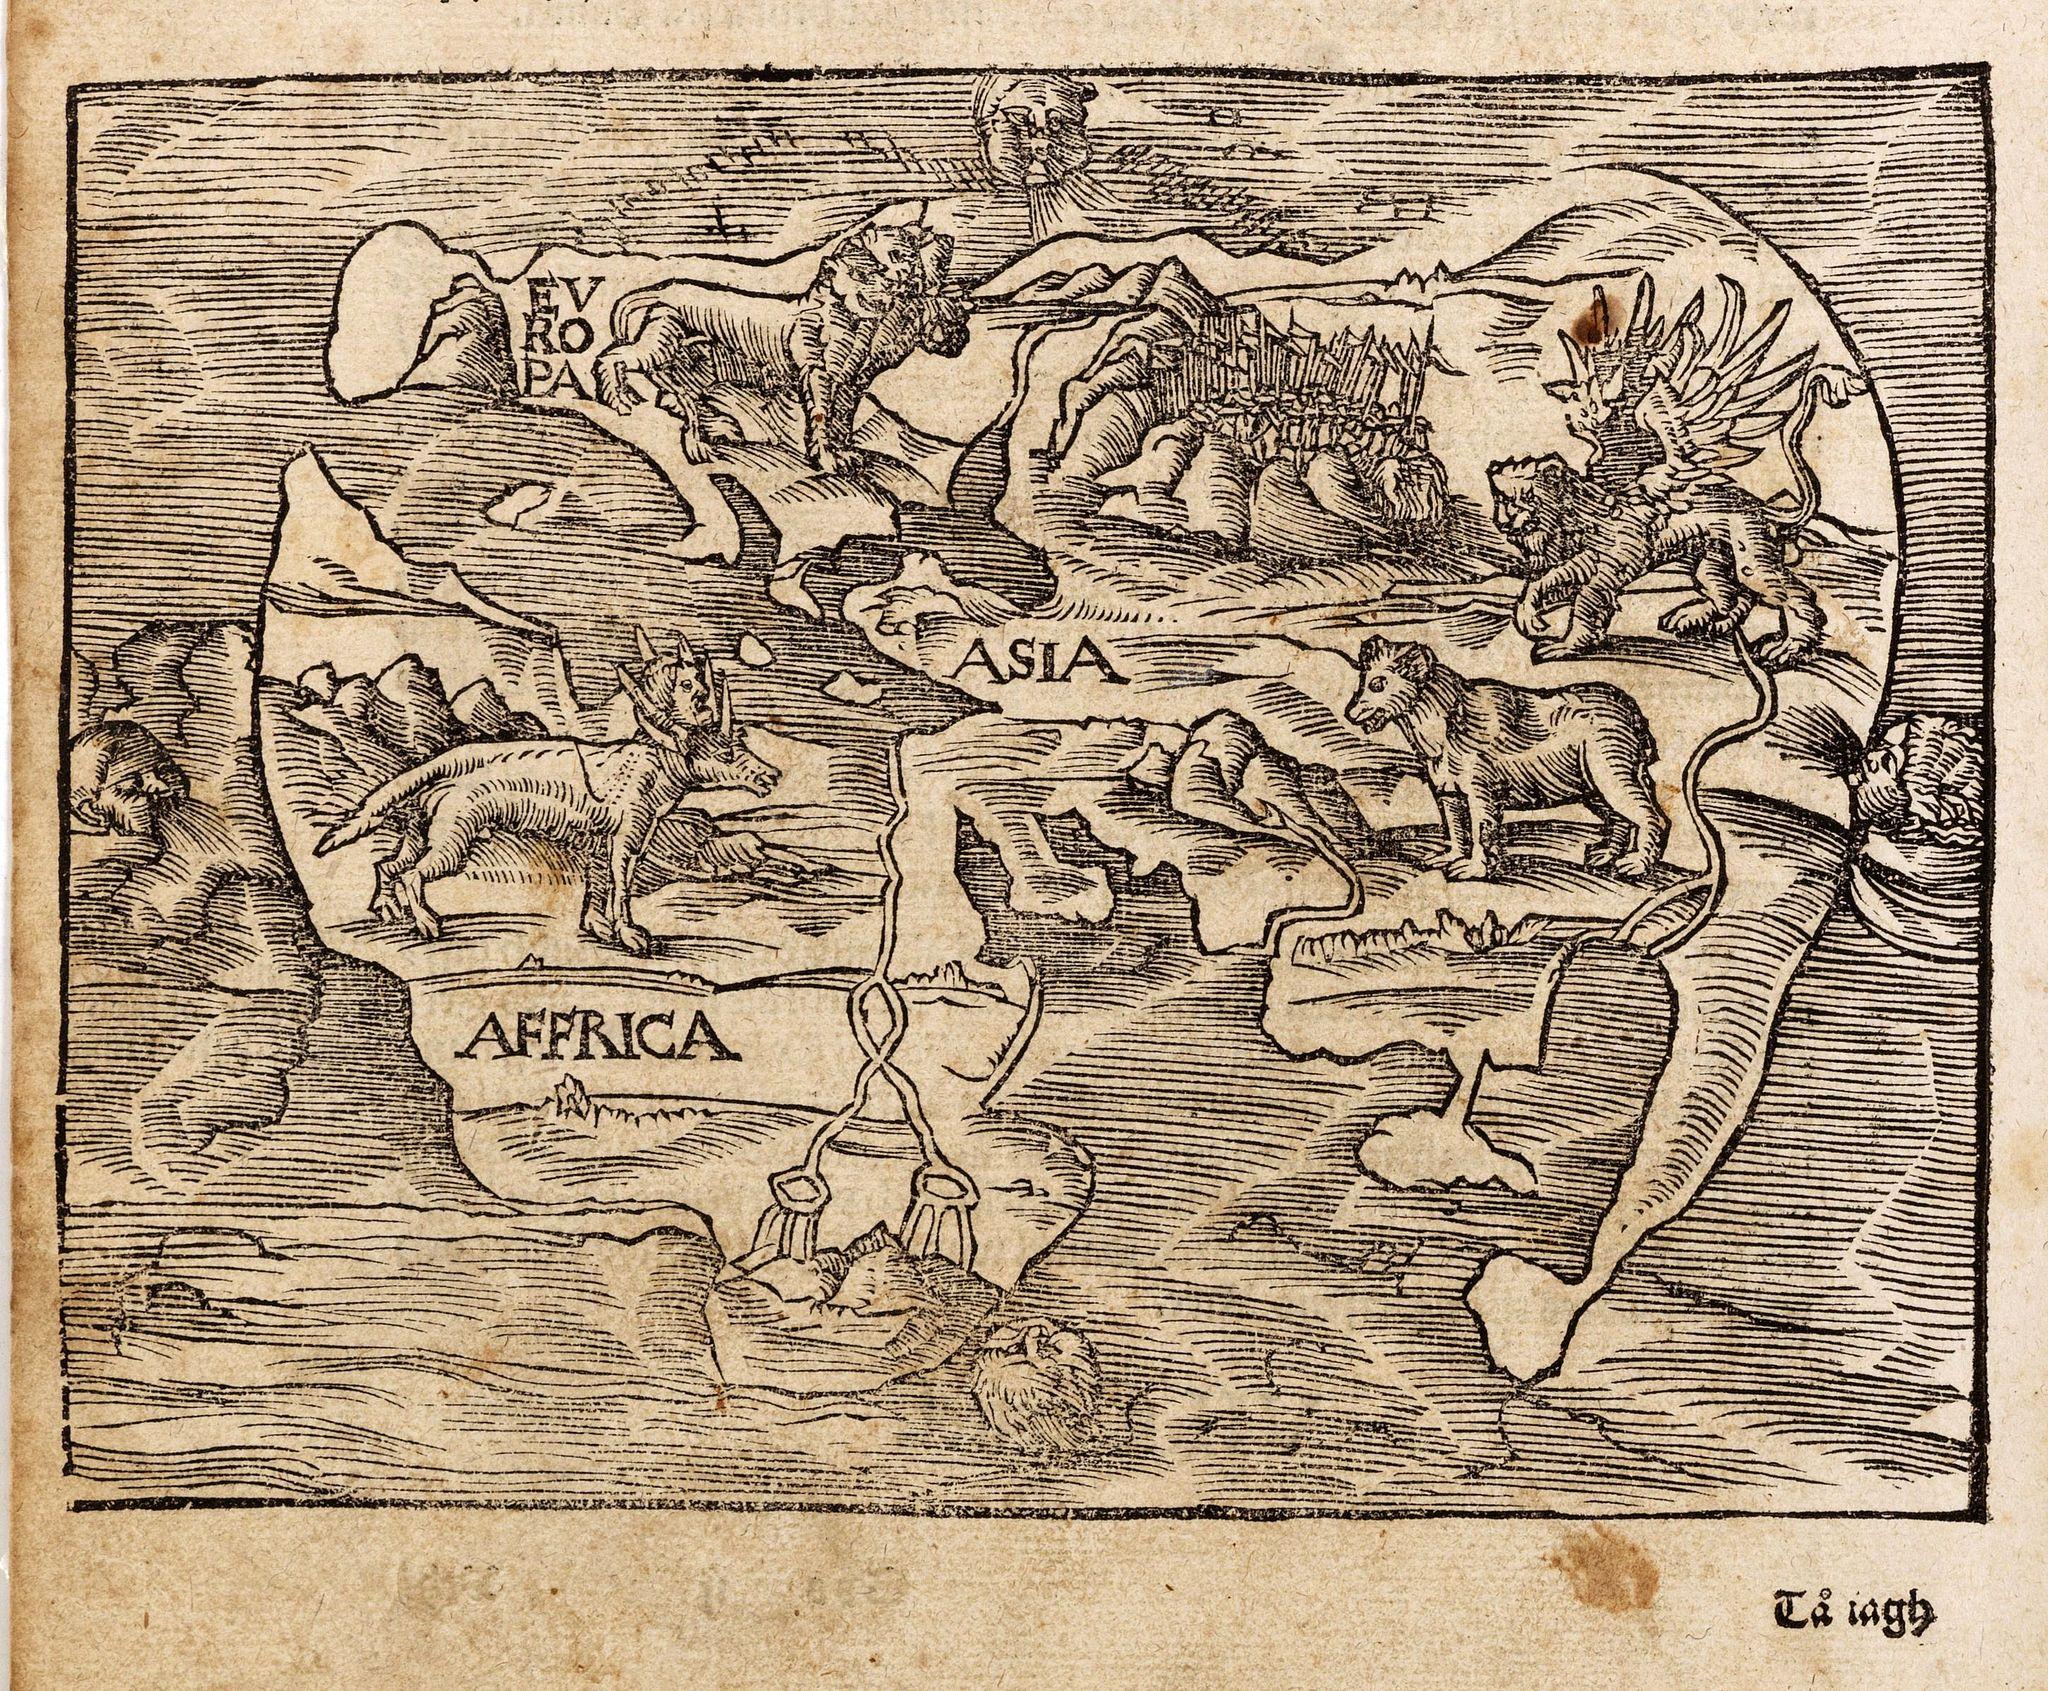 LUFT,H. after -  [No title - Daniel's Dream map - Rare Swedish edition]